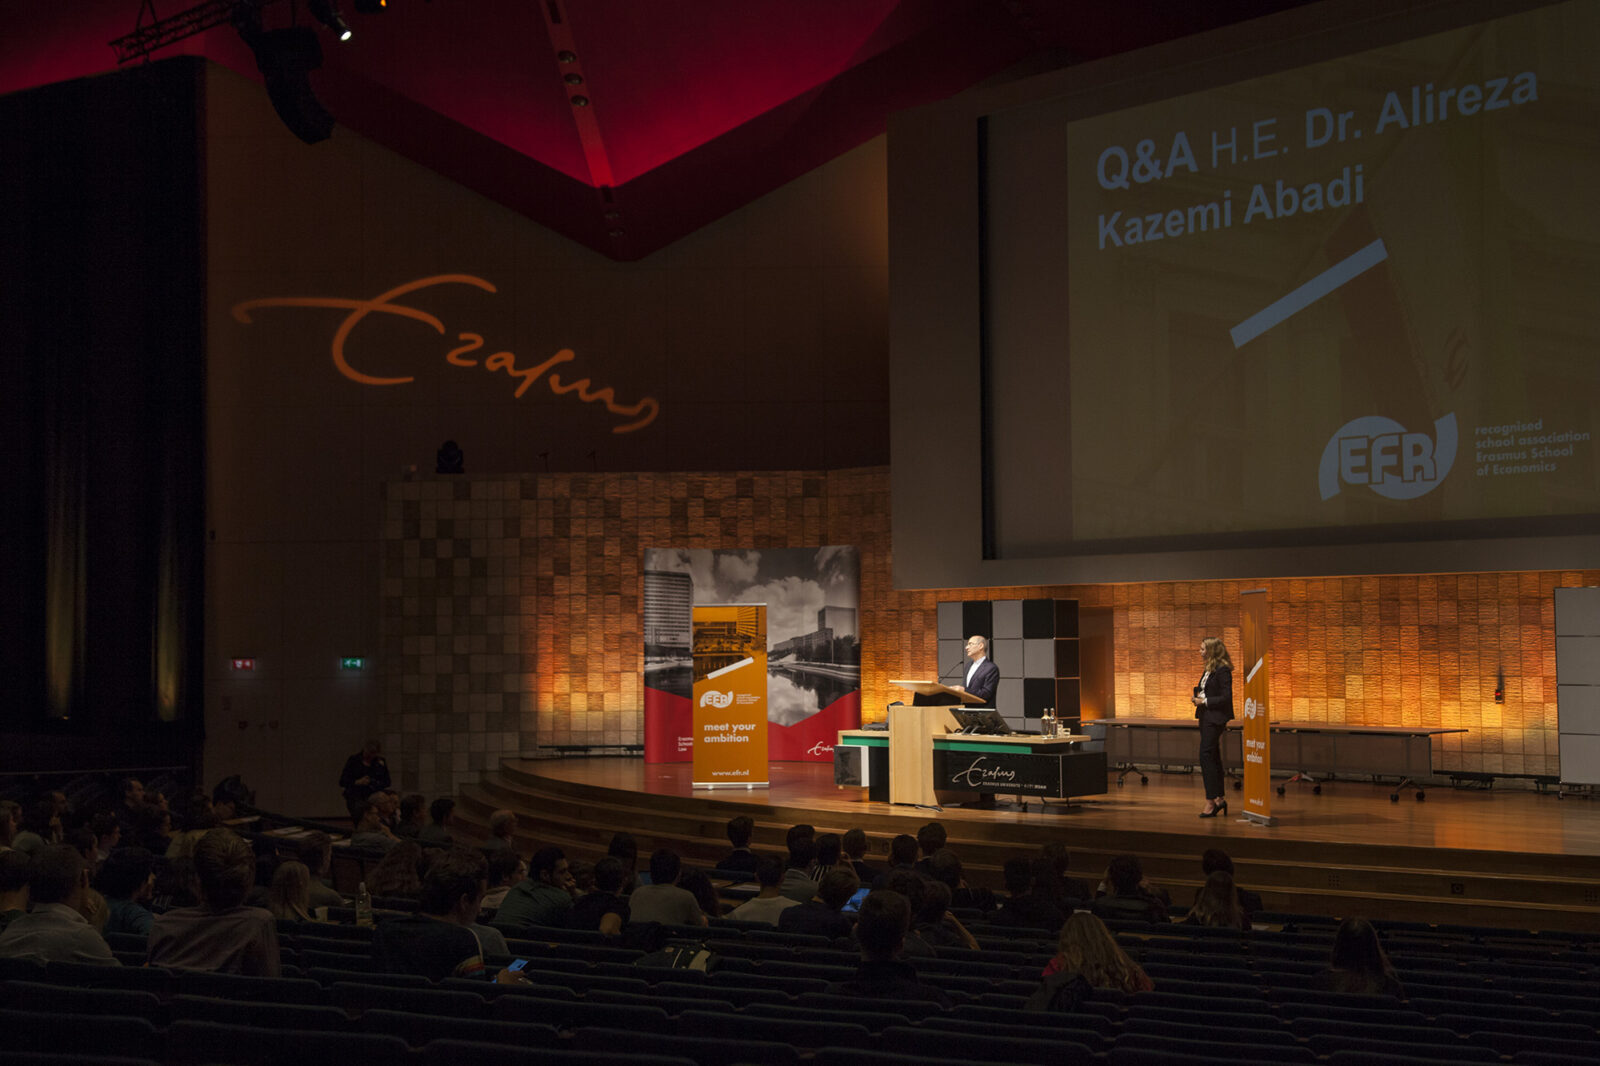 iran-ambassadeur-kazem-abadi-irandeal-Internationale-Economie-aula-foto-Amber-Leijen-8-1600×1066